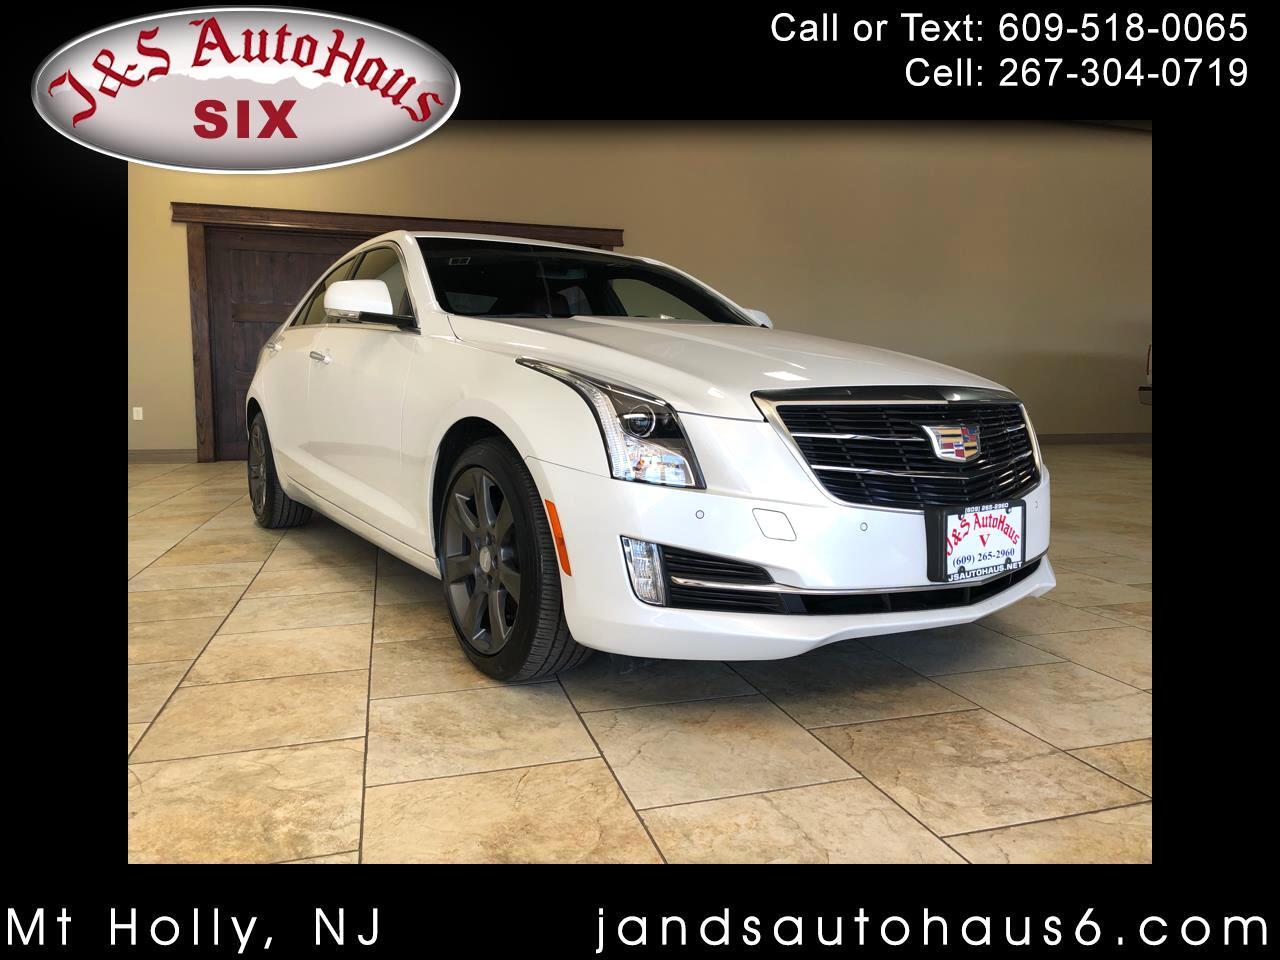 2015 Cadillac ATS Sedan 4dr Sdn 2.0L Performance AWD